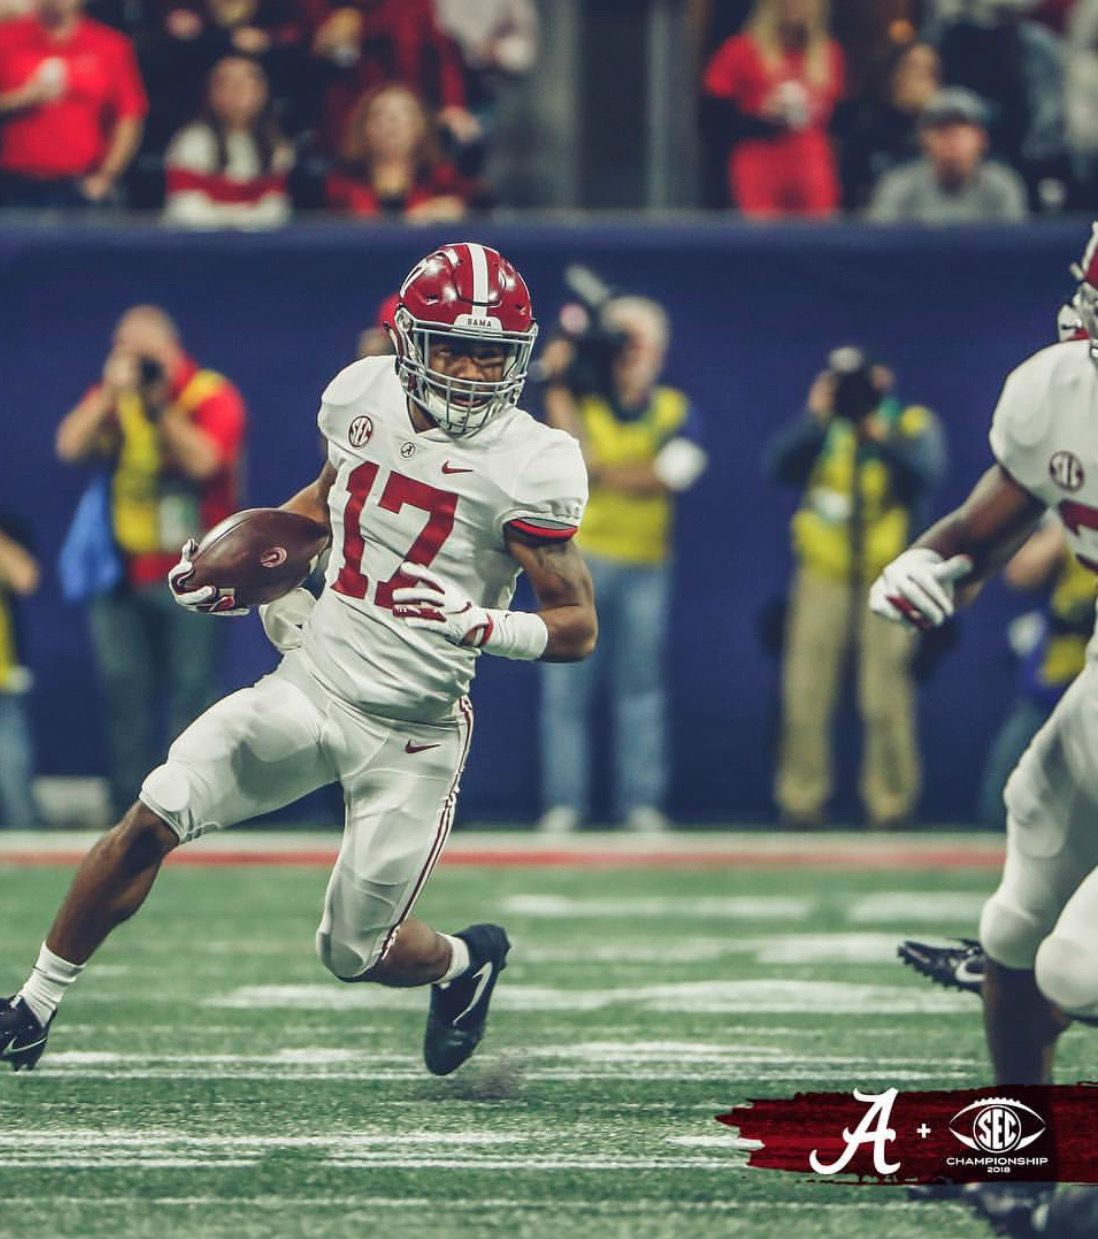 Jaylen Waddle Alabama 35 Georgia 28 In The 2018 Sec Championship Game In Atlanta Alabama Rollti Alabama Football Crimson Tide Football Alabama Crimson Tide